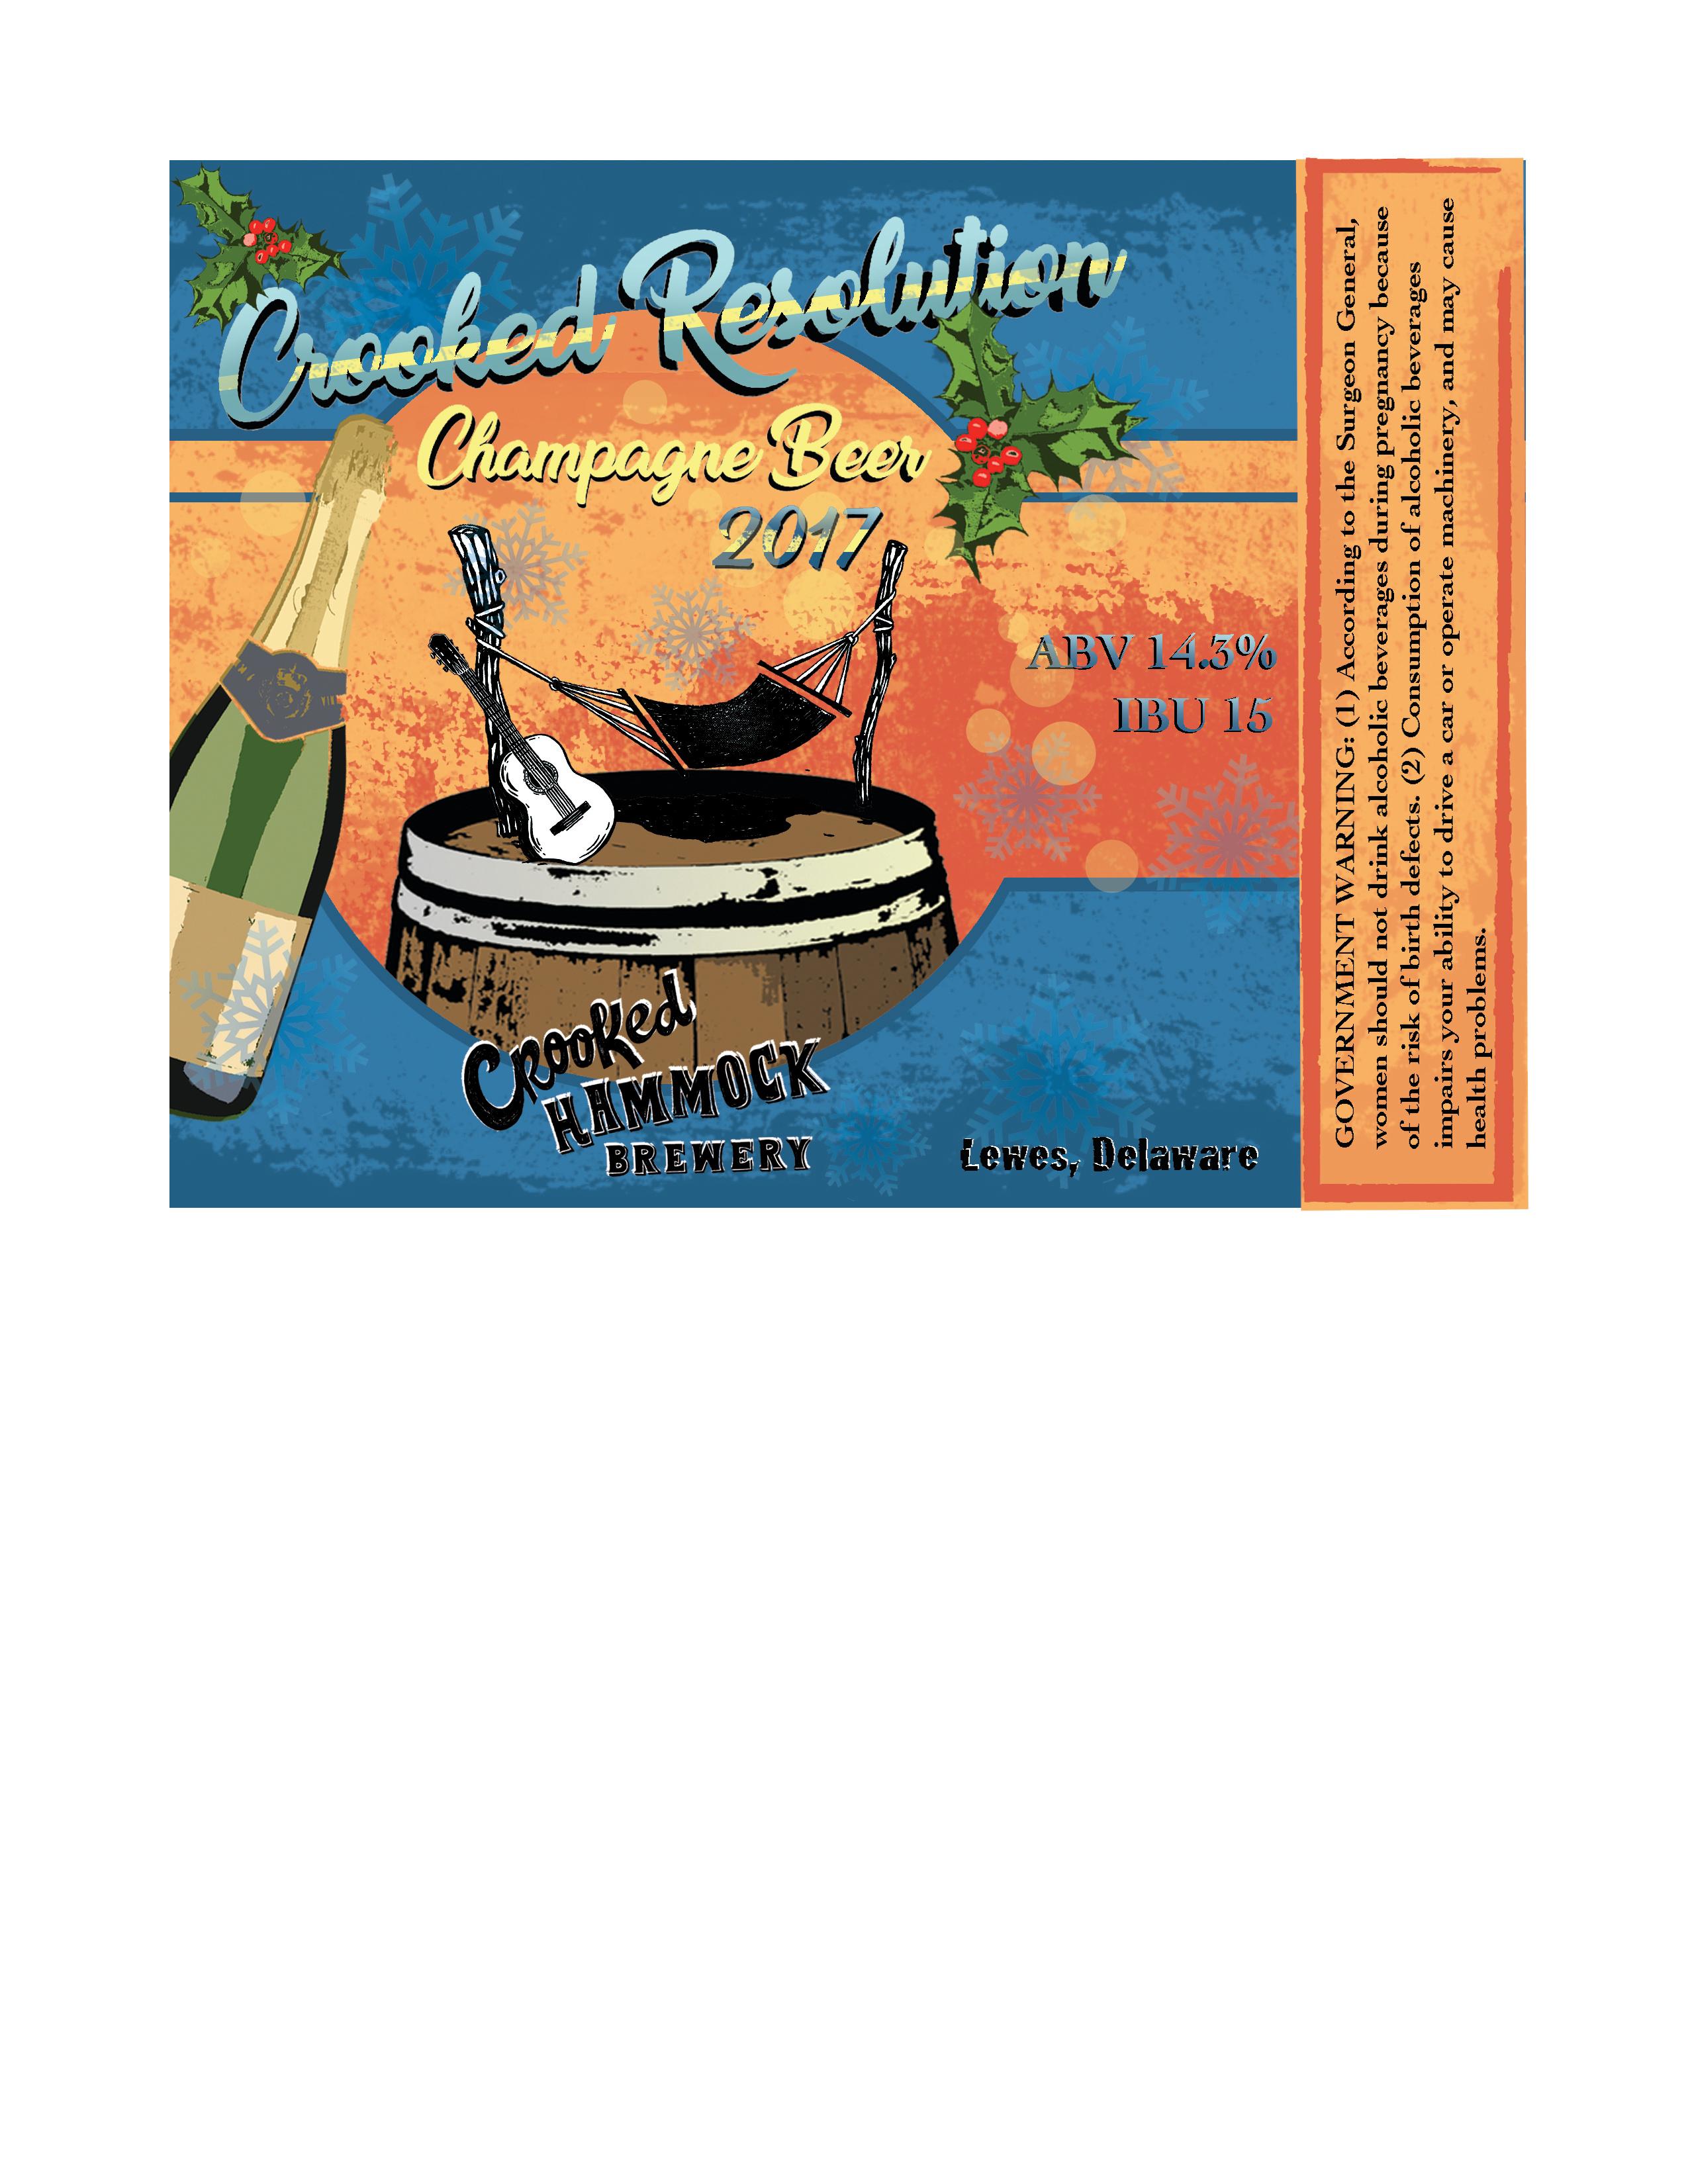 CrookedResolution03 copy